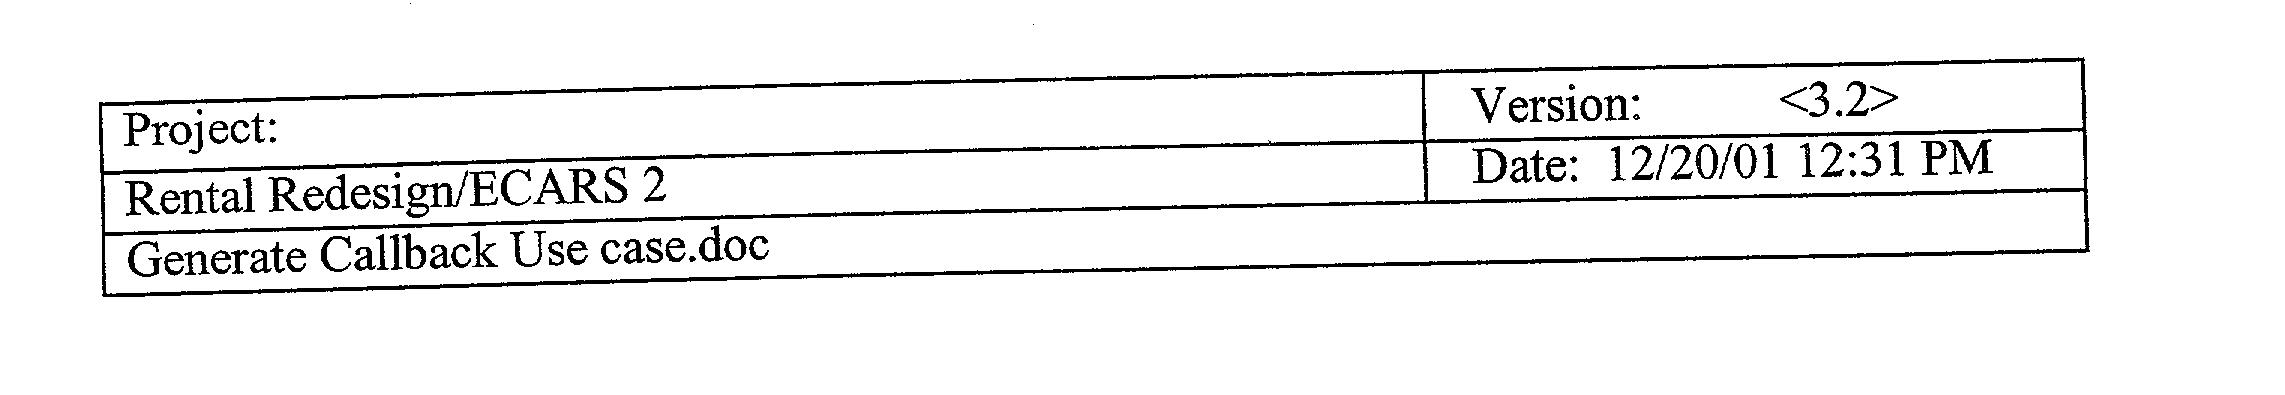 Figure US20030125992A1-20030703-P02051